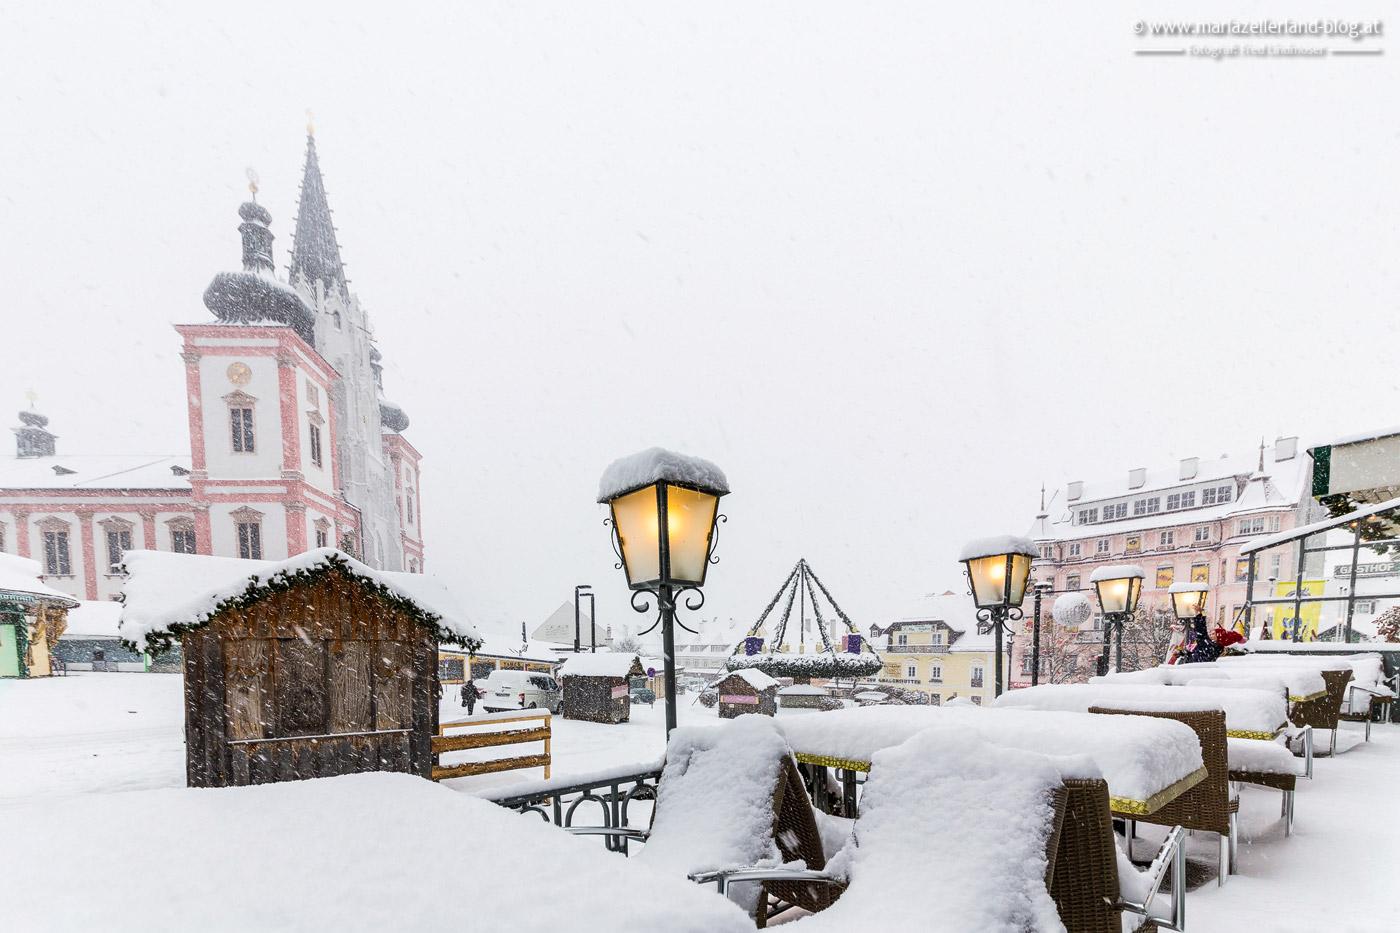 Mariazell-Schnee-Winter-Basilika-IMG_0687